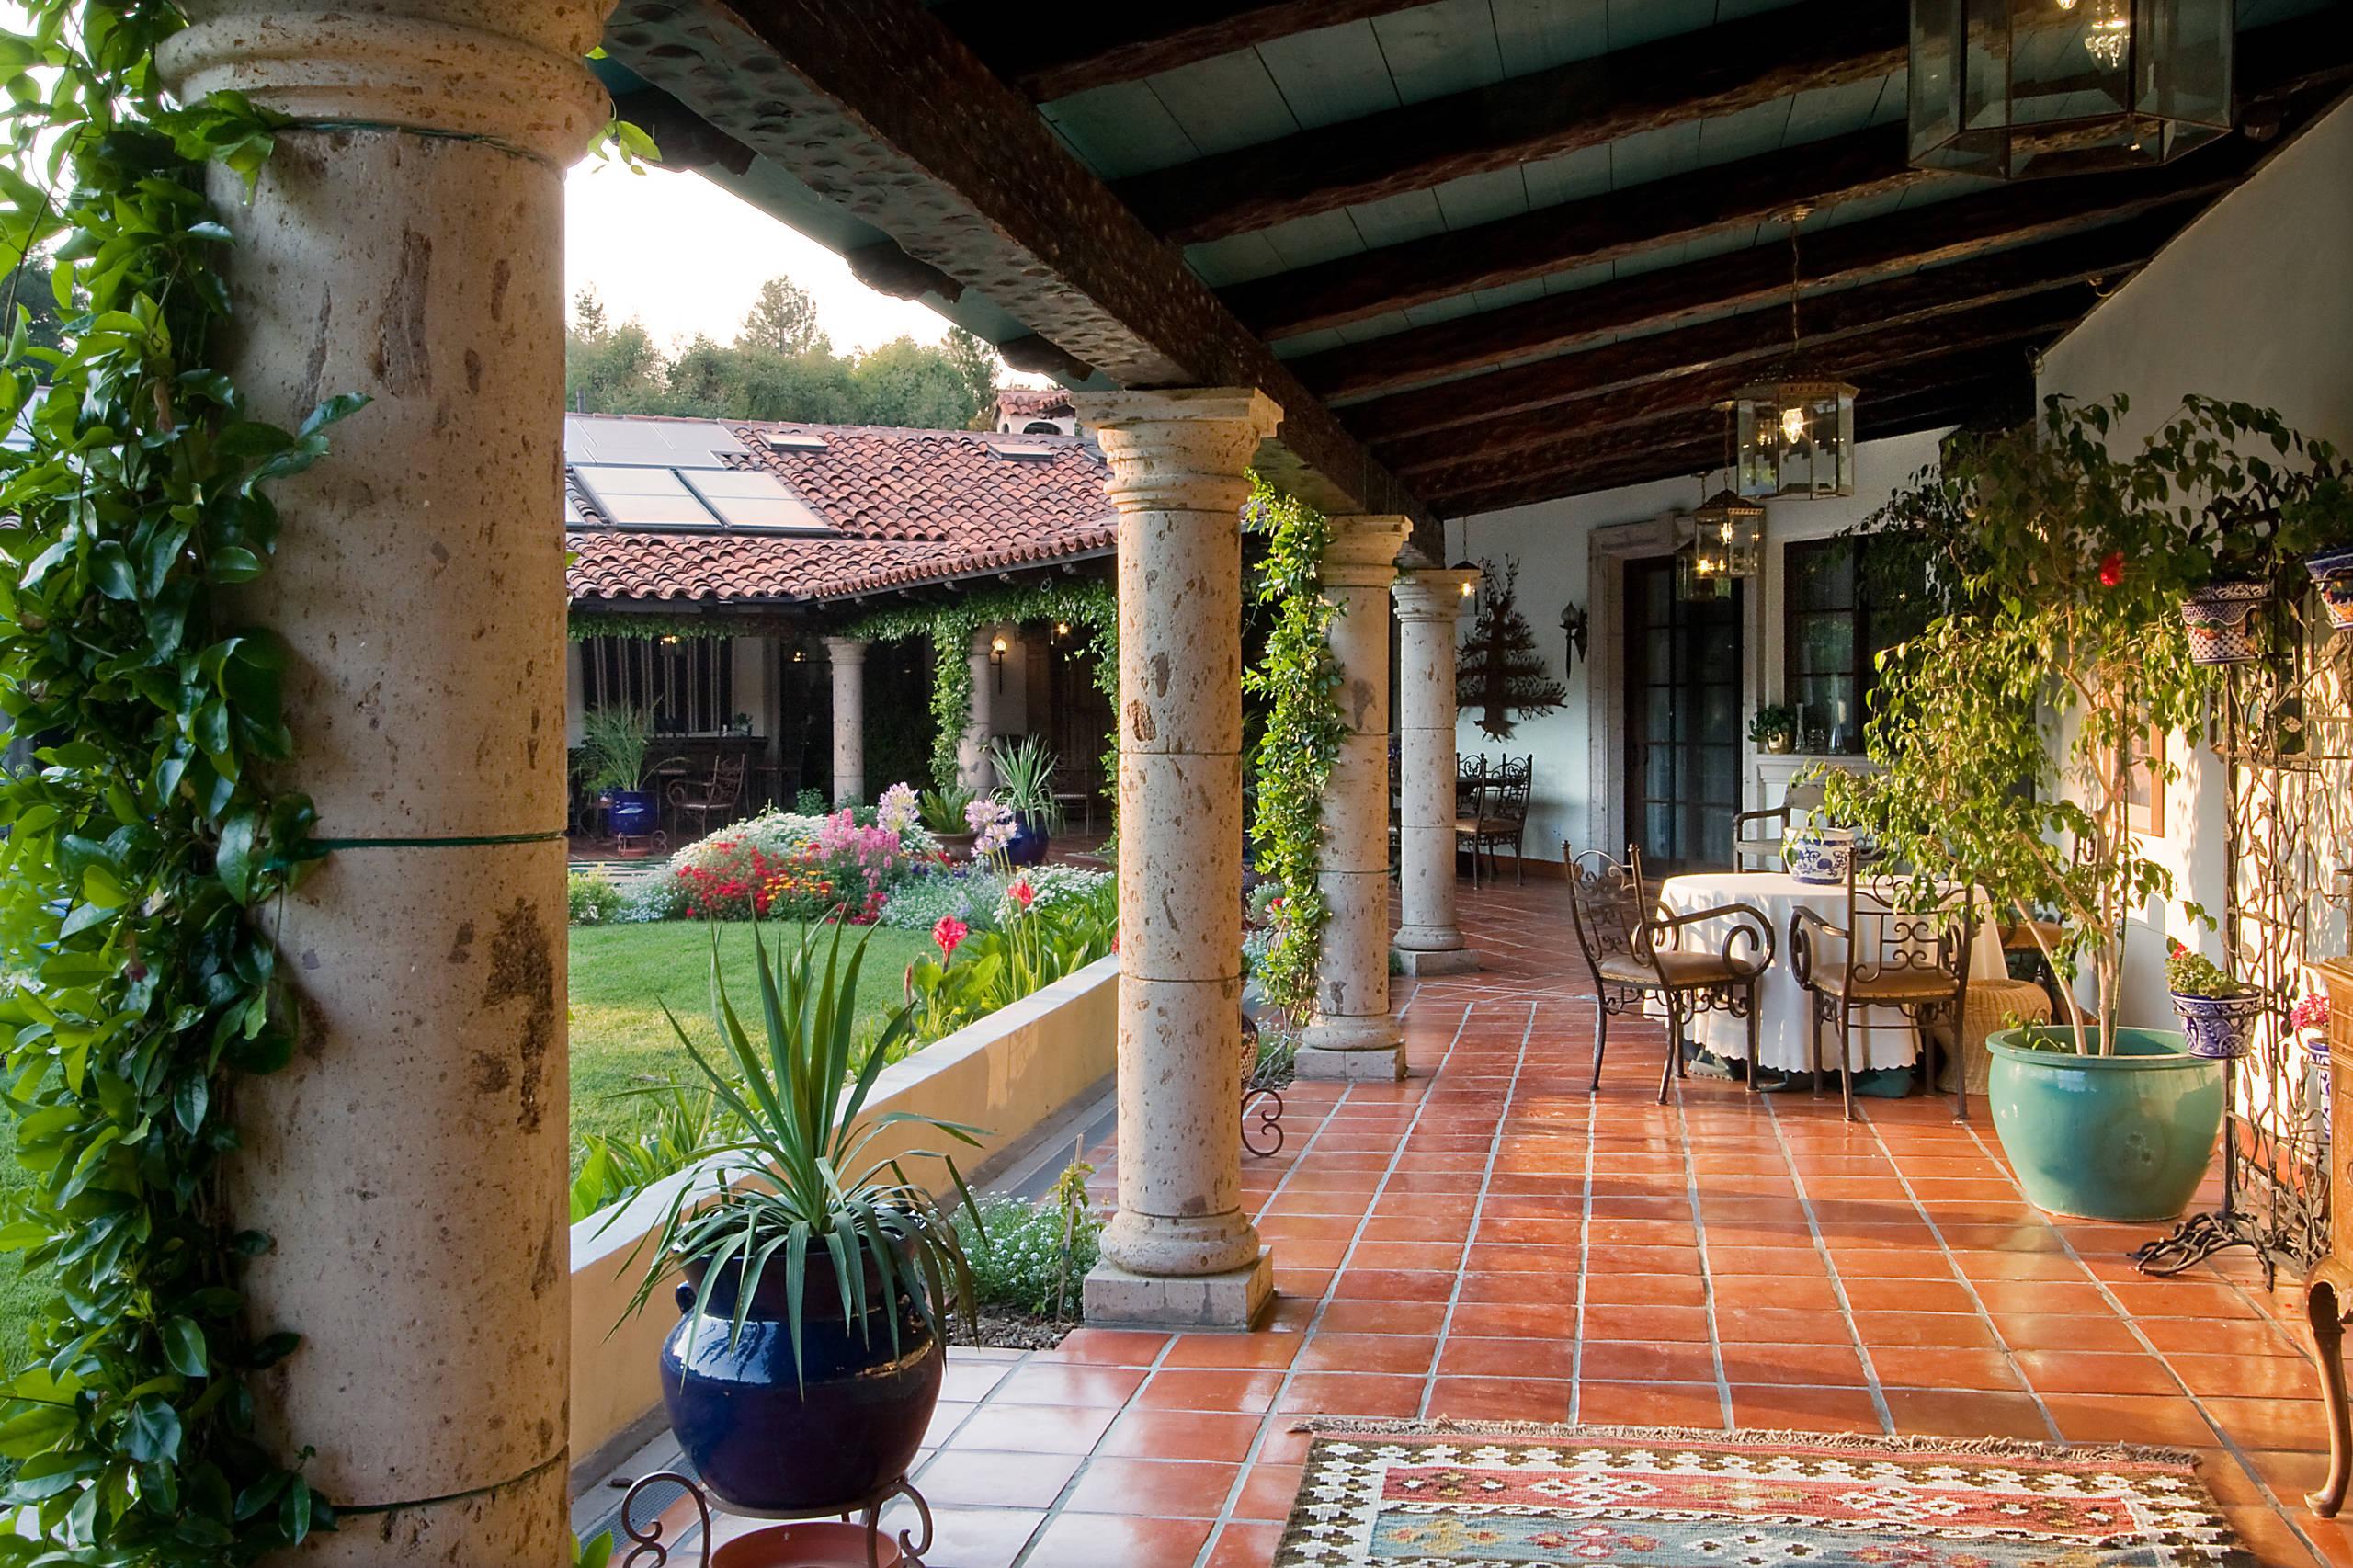 20 Stunning Mediterranean Porch Designs You'll Fall In ... on Mexican Patio Ideas id=94304